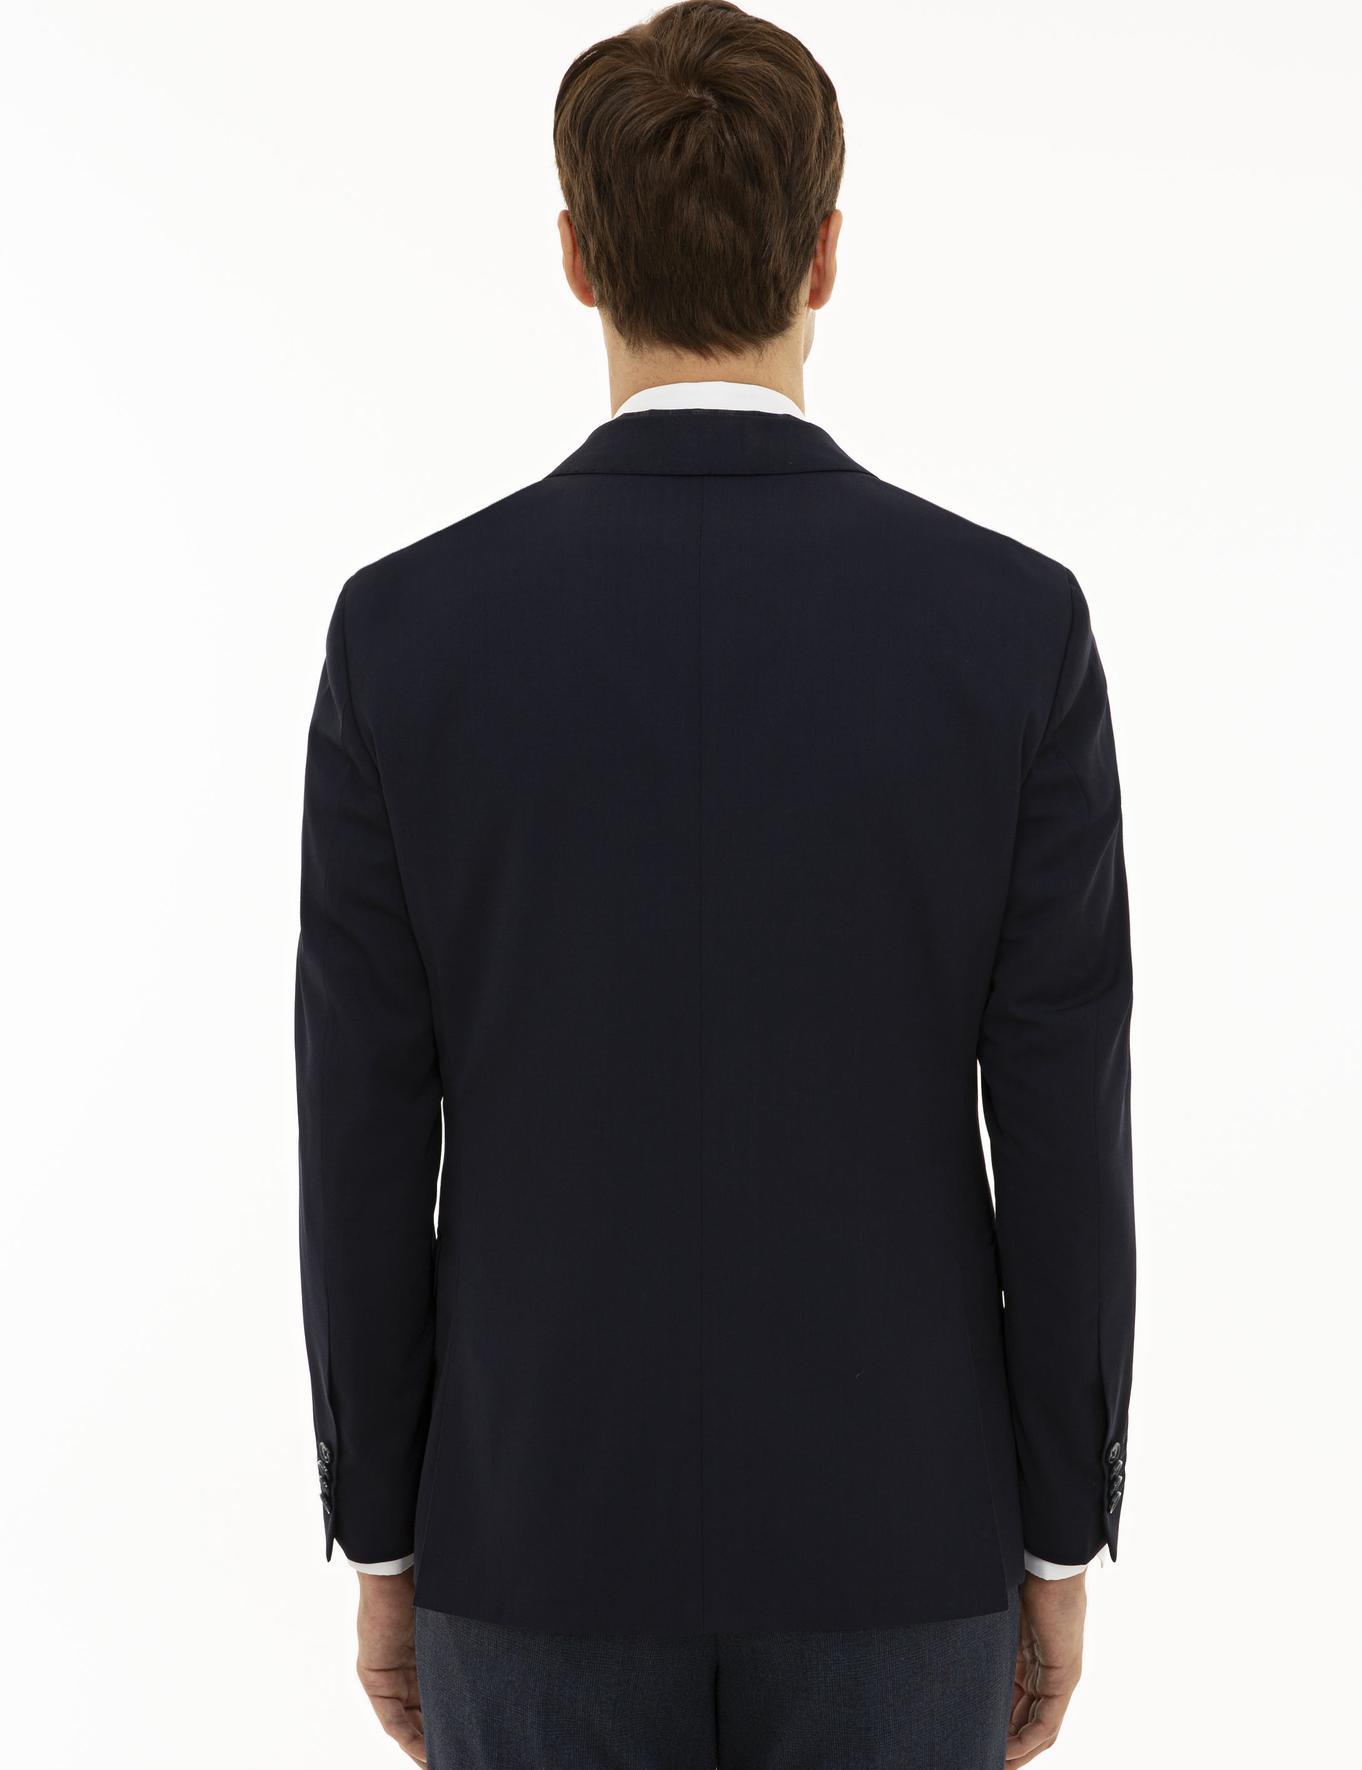 Lacivert Slim Fit Ceket - 50197244038